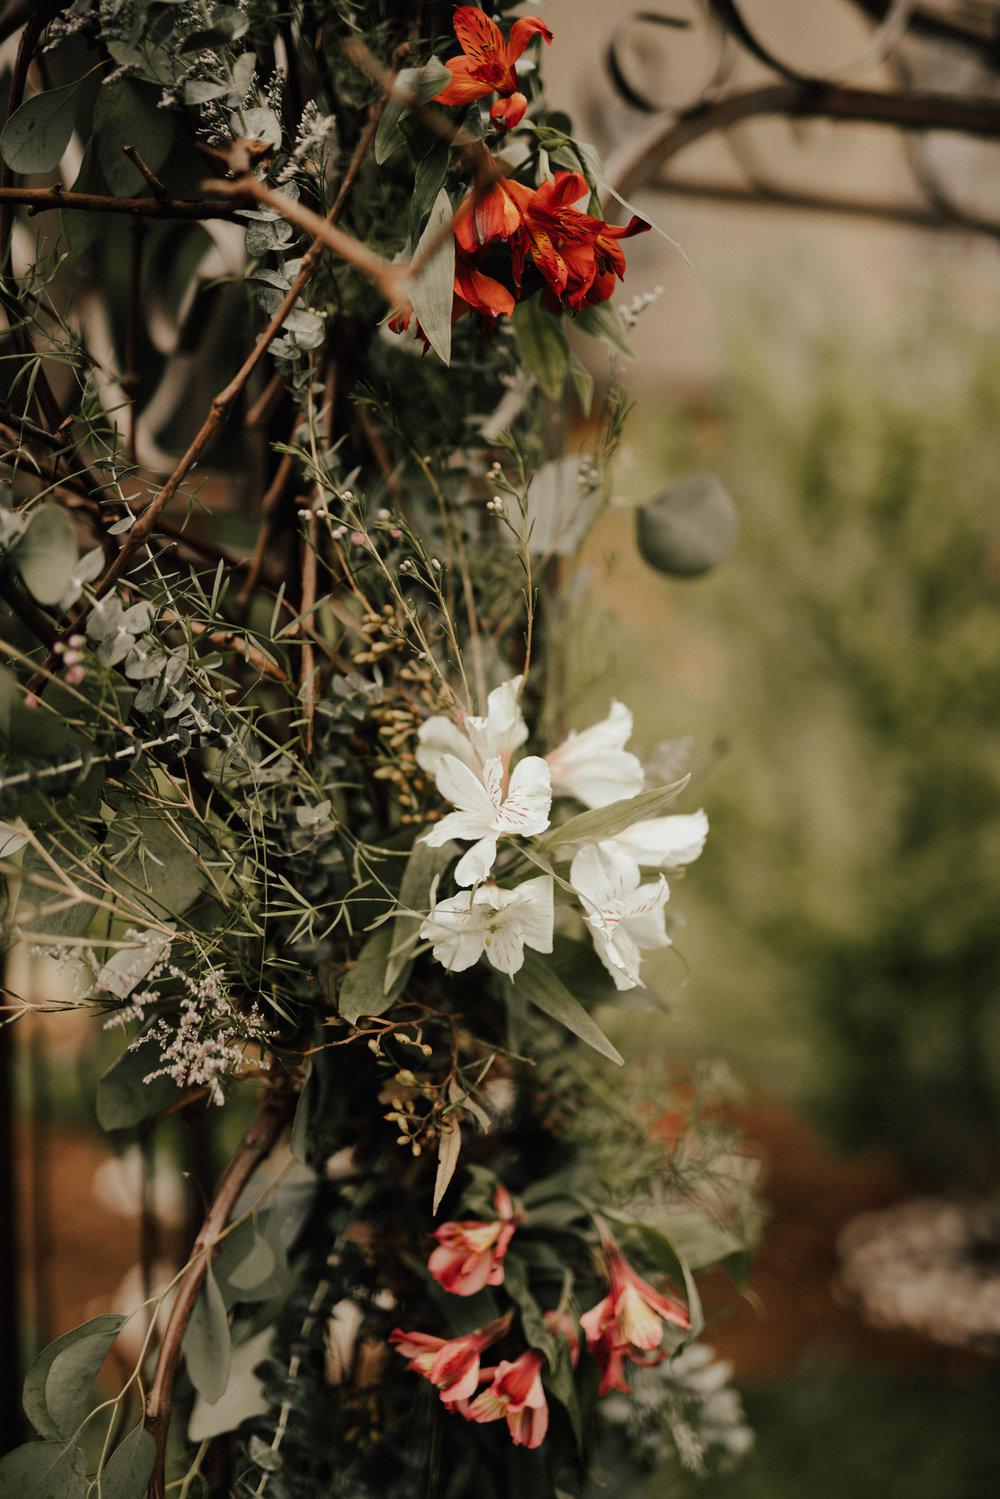 dc139-erinkrespanphotography_wedding4.jpg